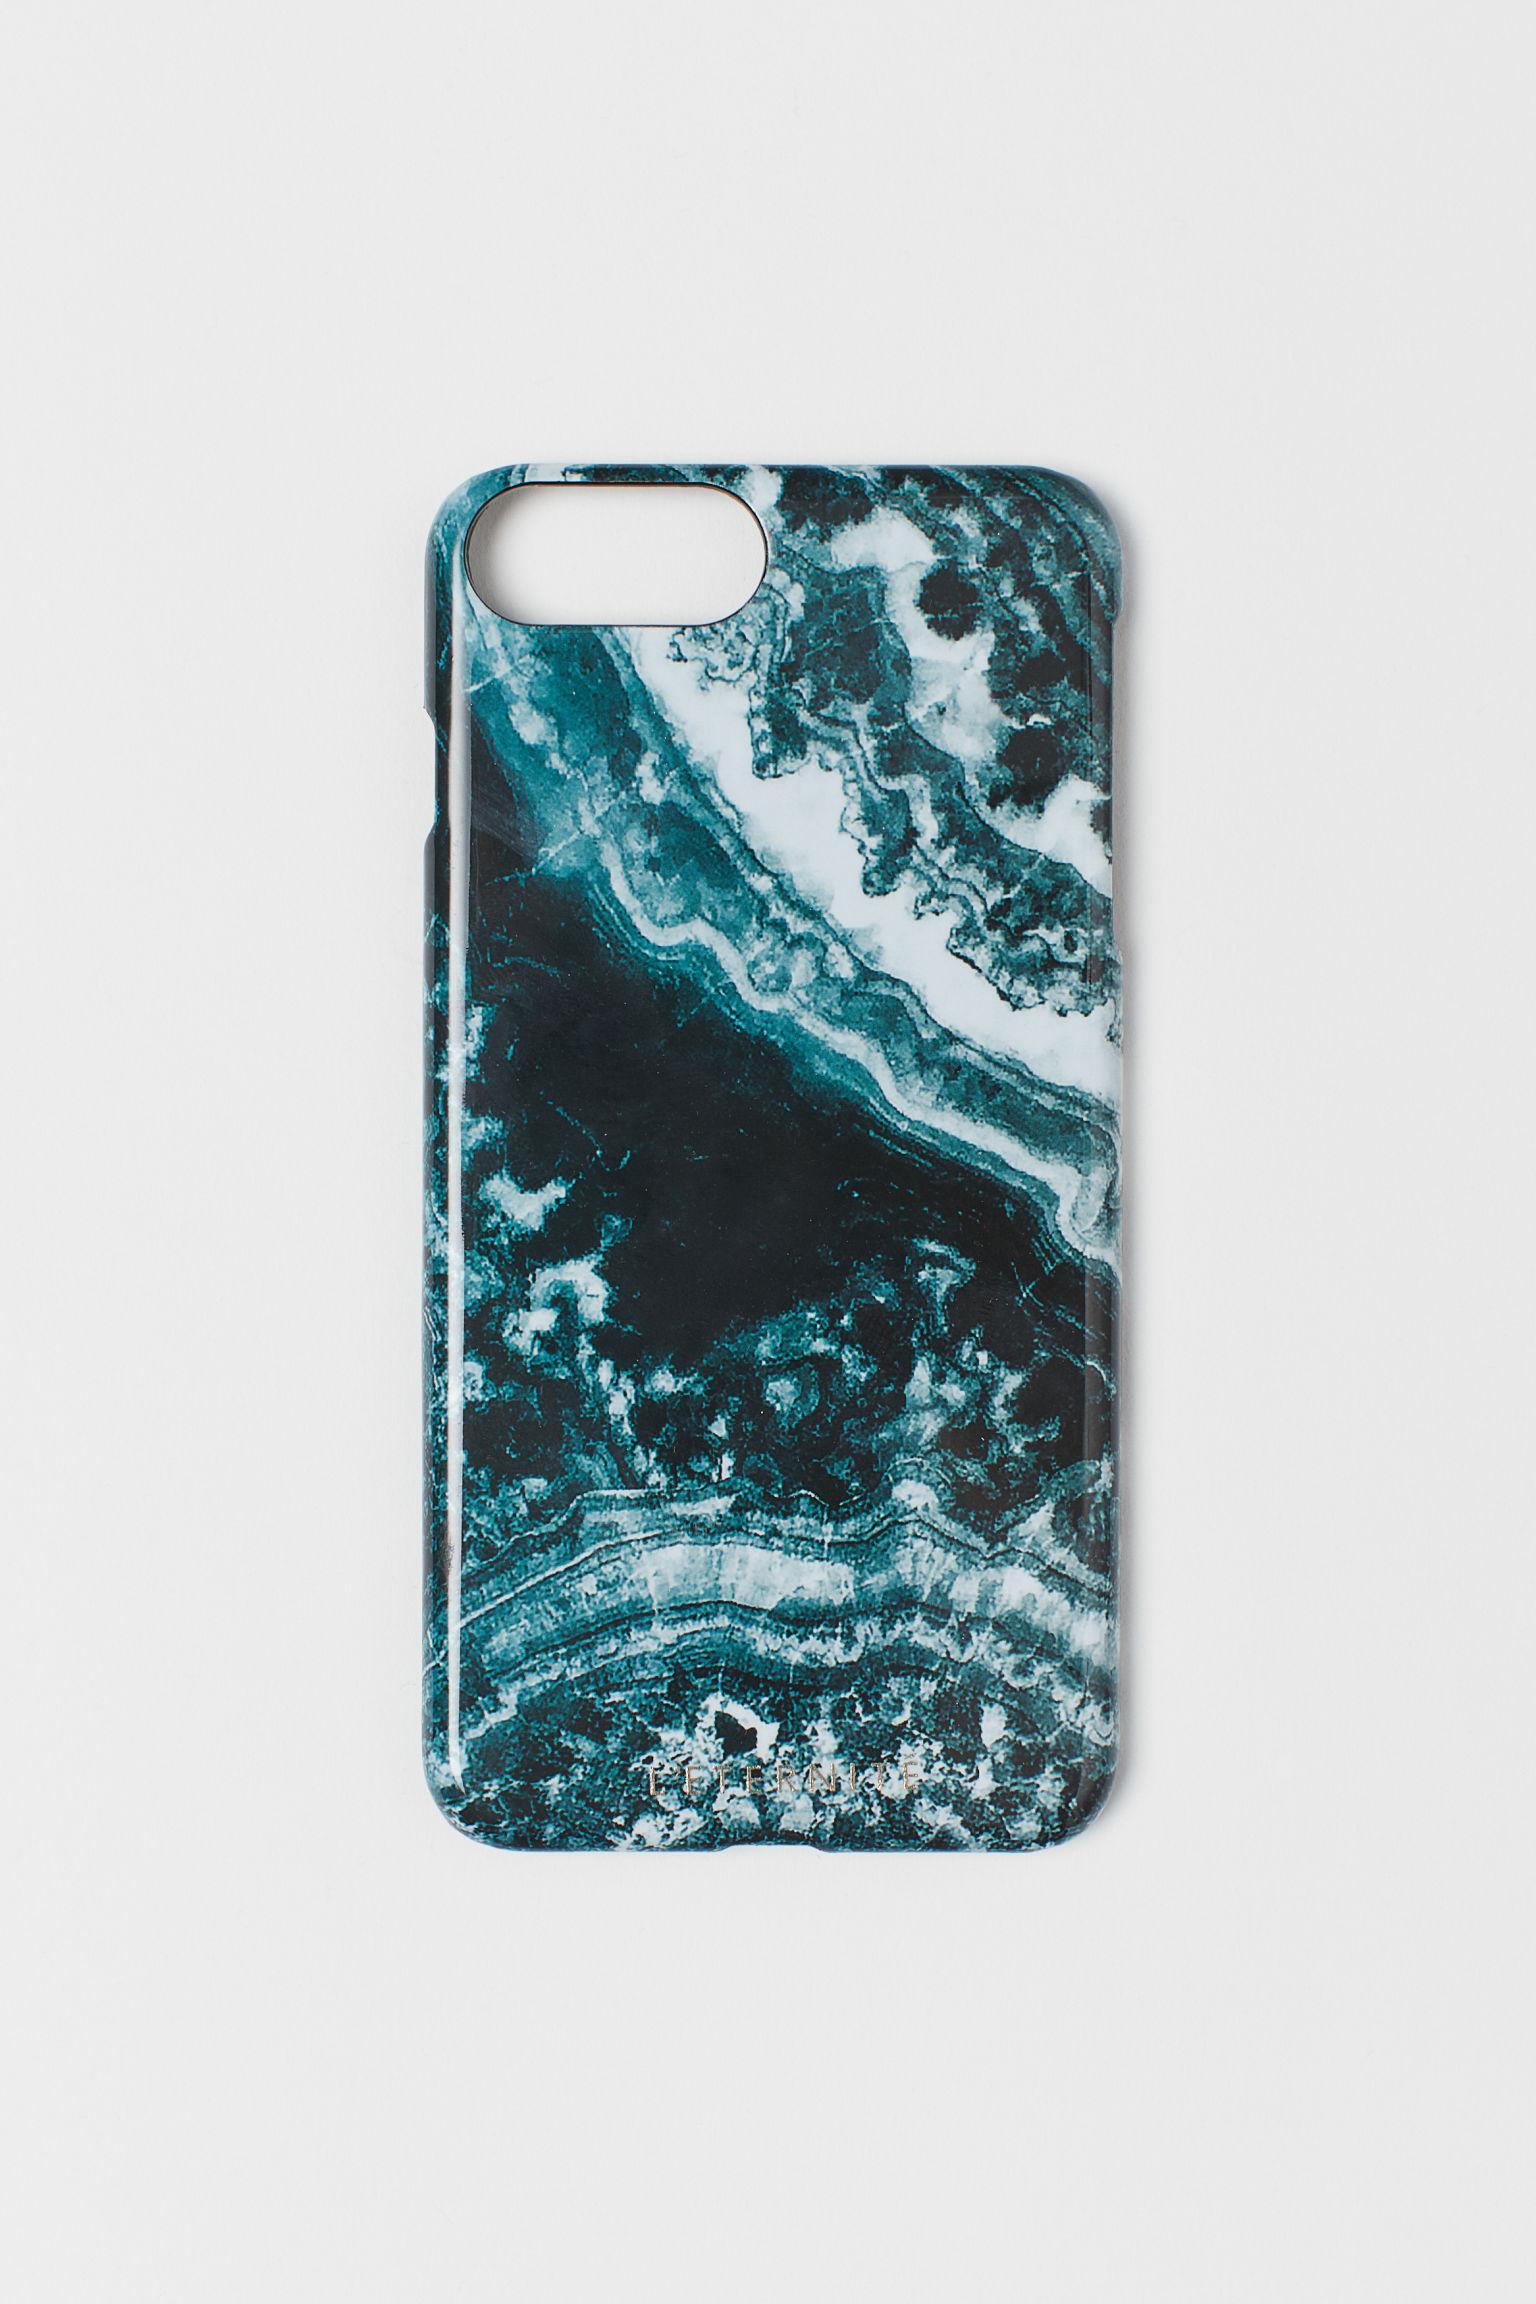 hm silver Coque pour iPhone 6 a 8